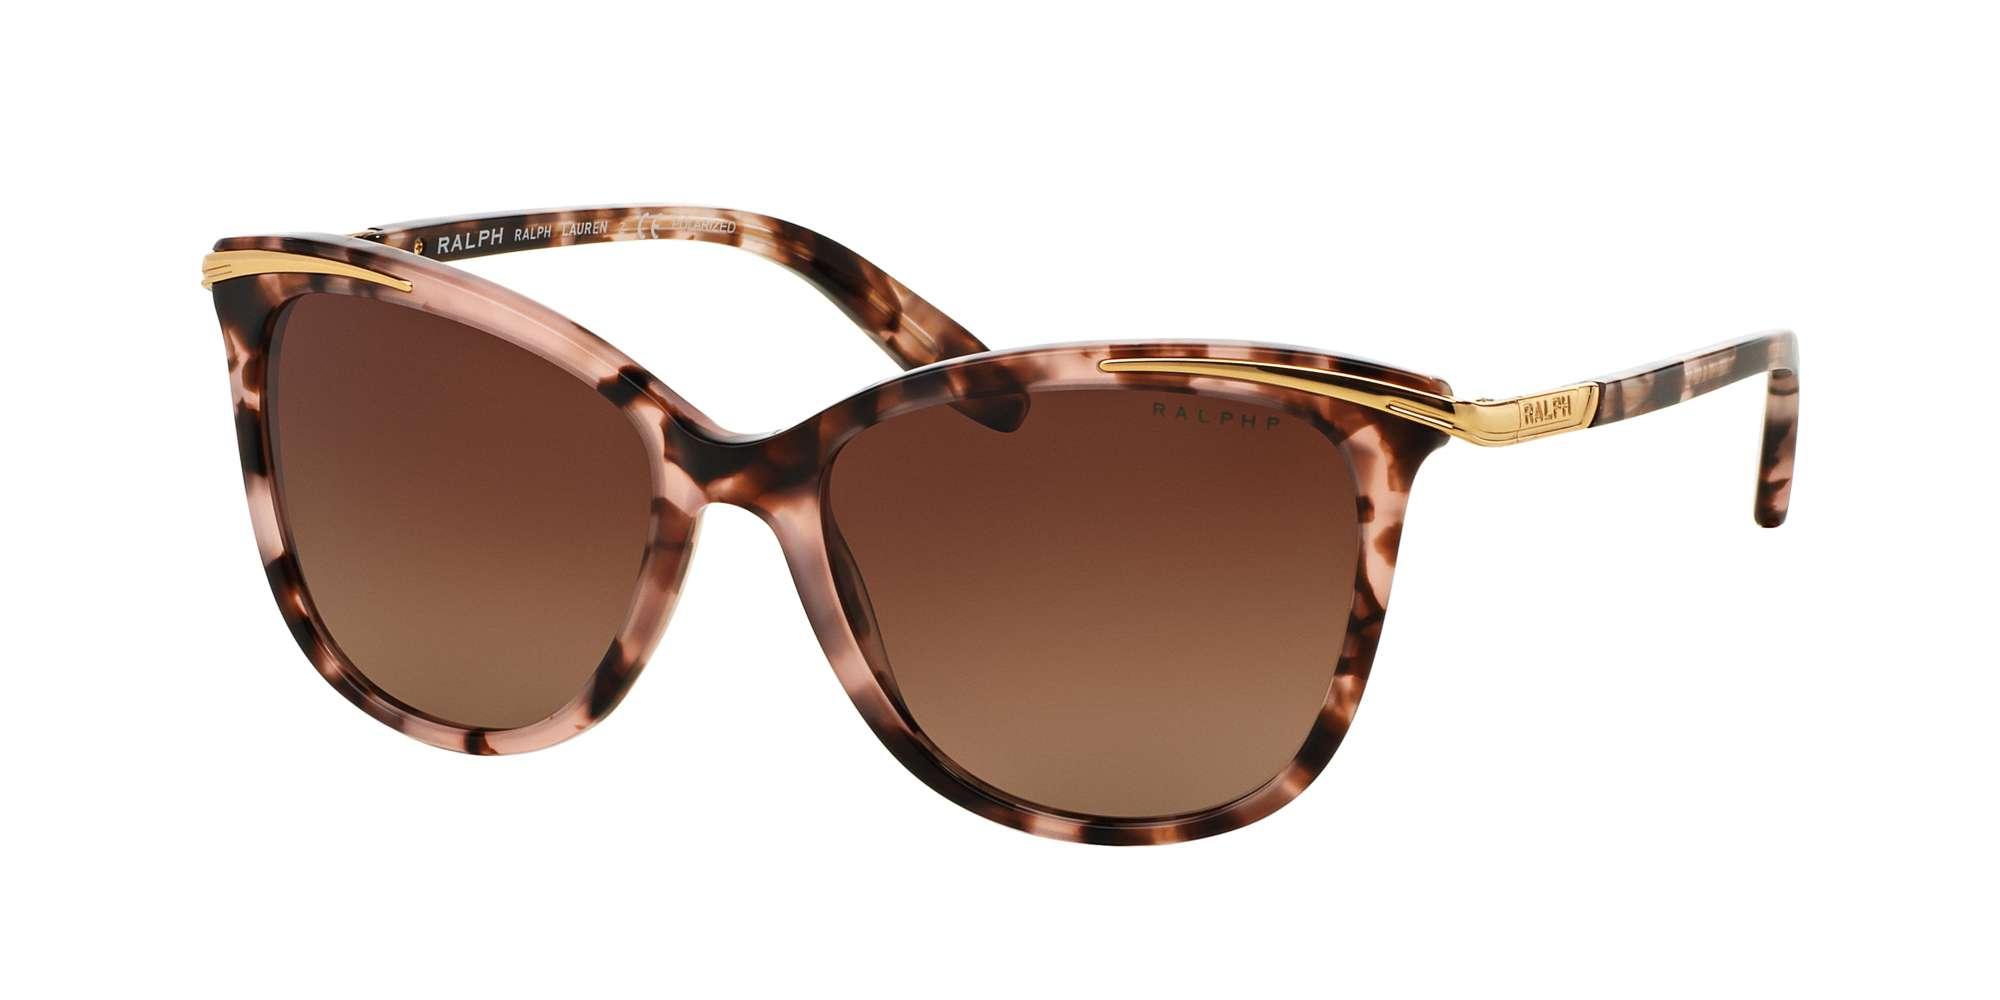 PINK TORTOISE / BROWN GRADIENT POLARIZED lenses